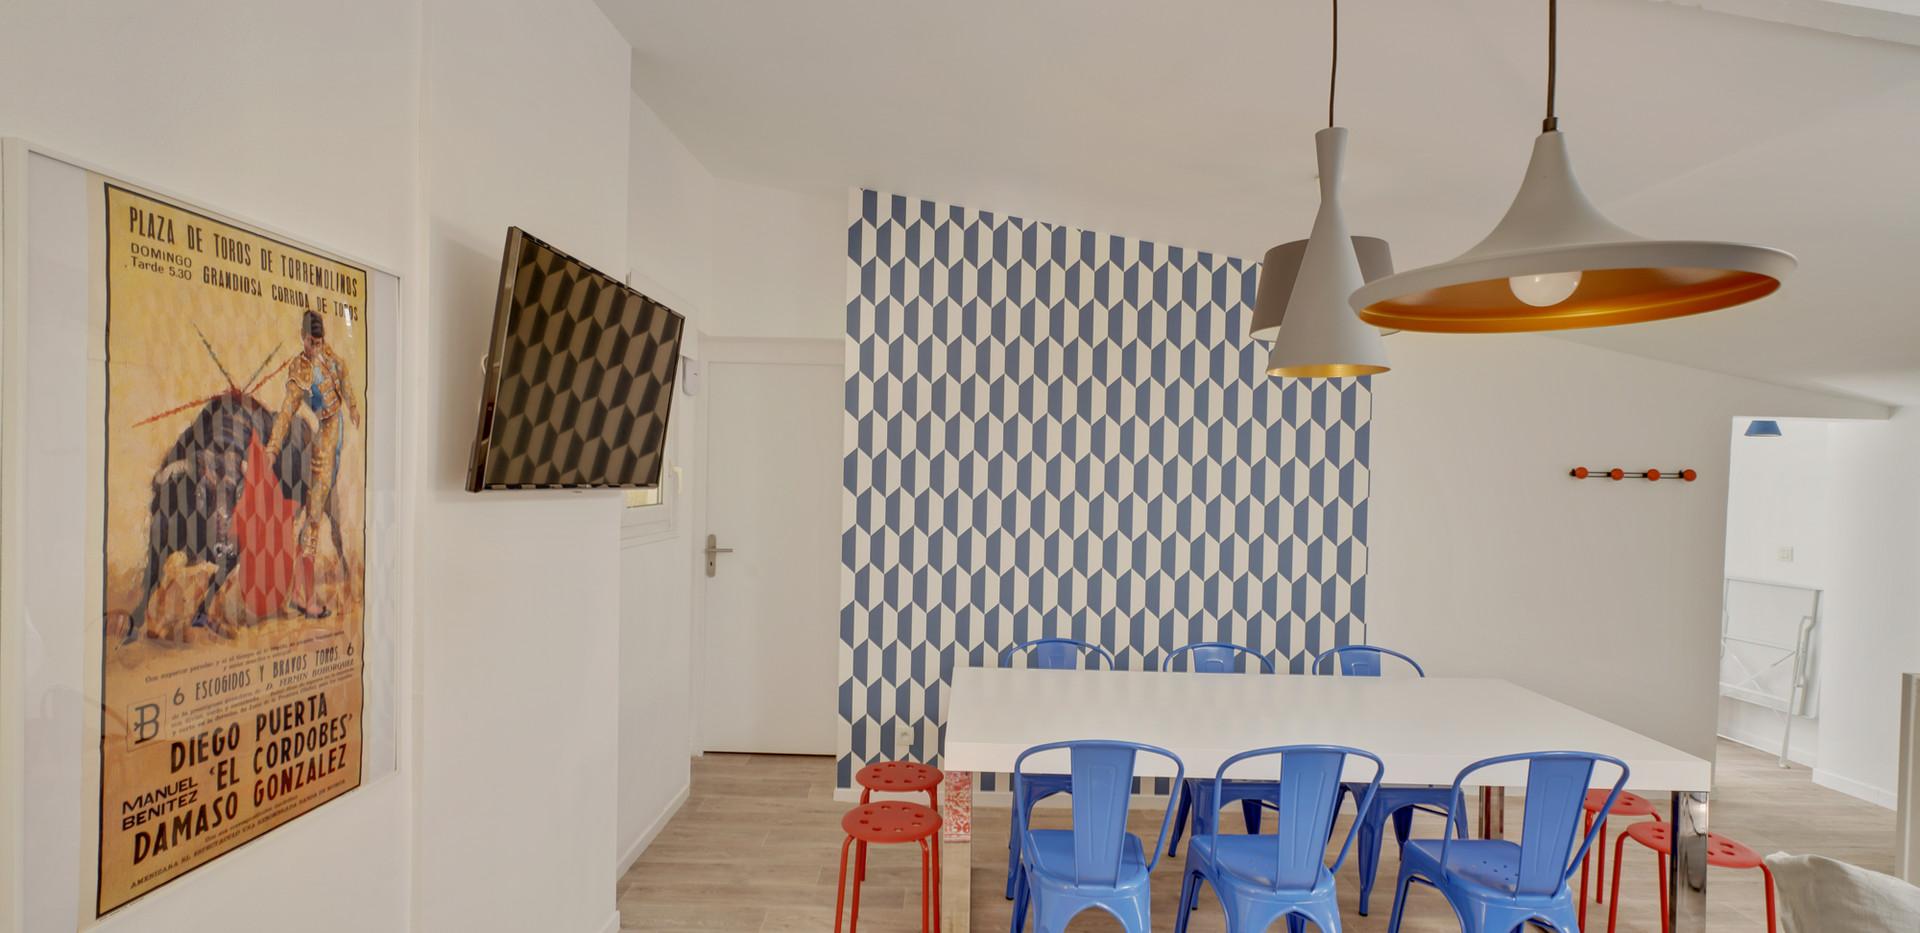 Maison des Amis, Mas Saint-Gens, holiday home for rent